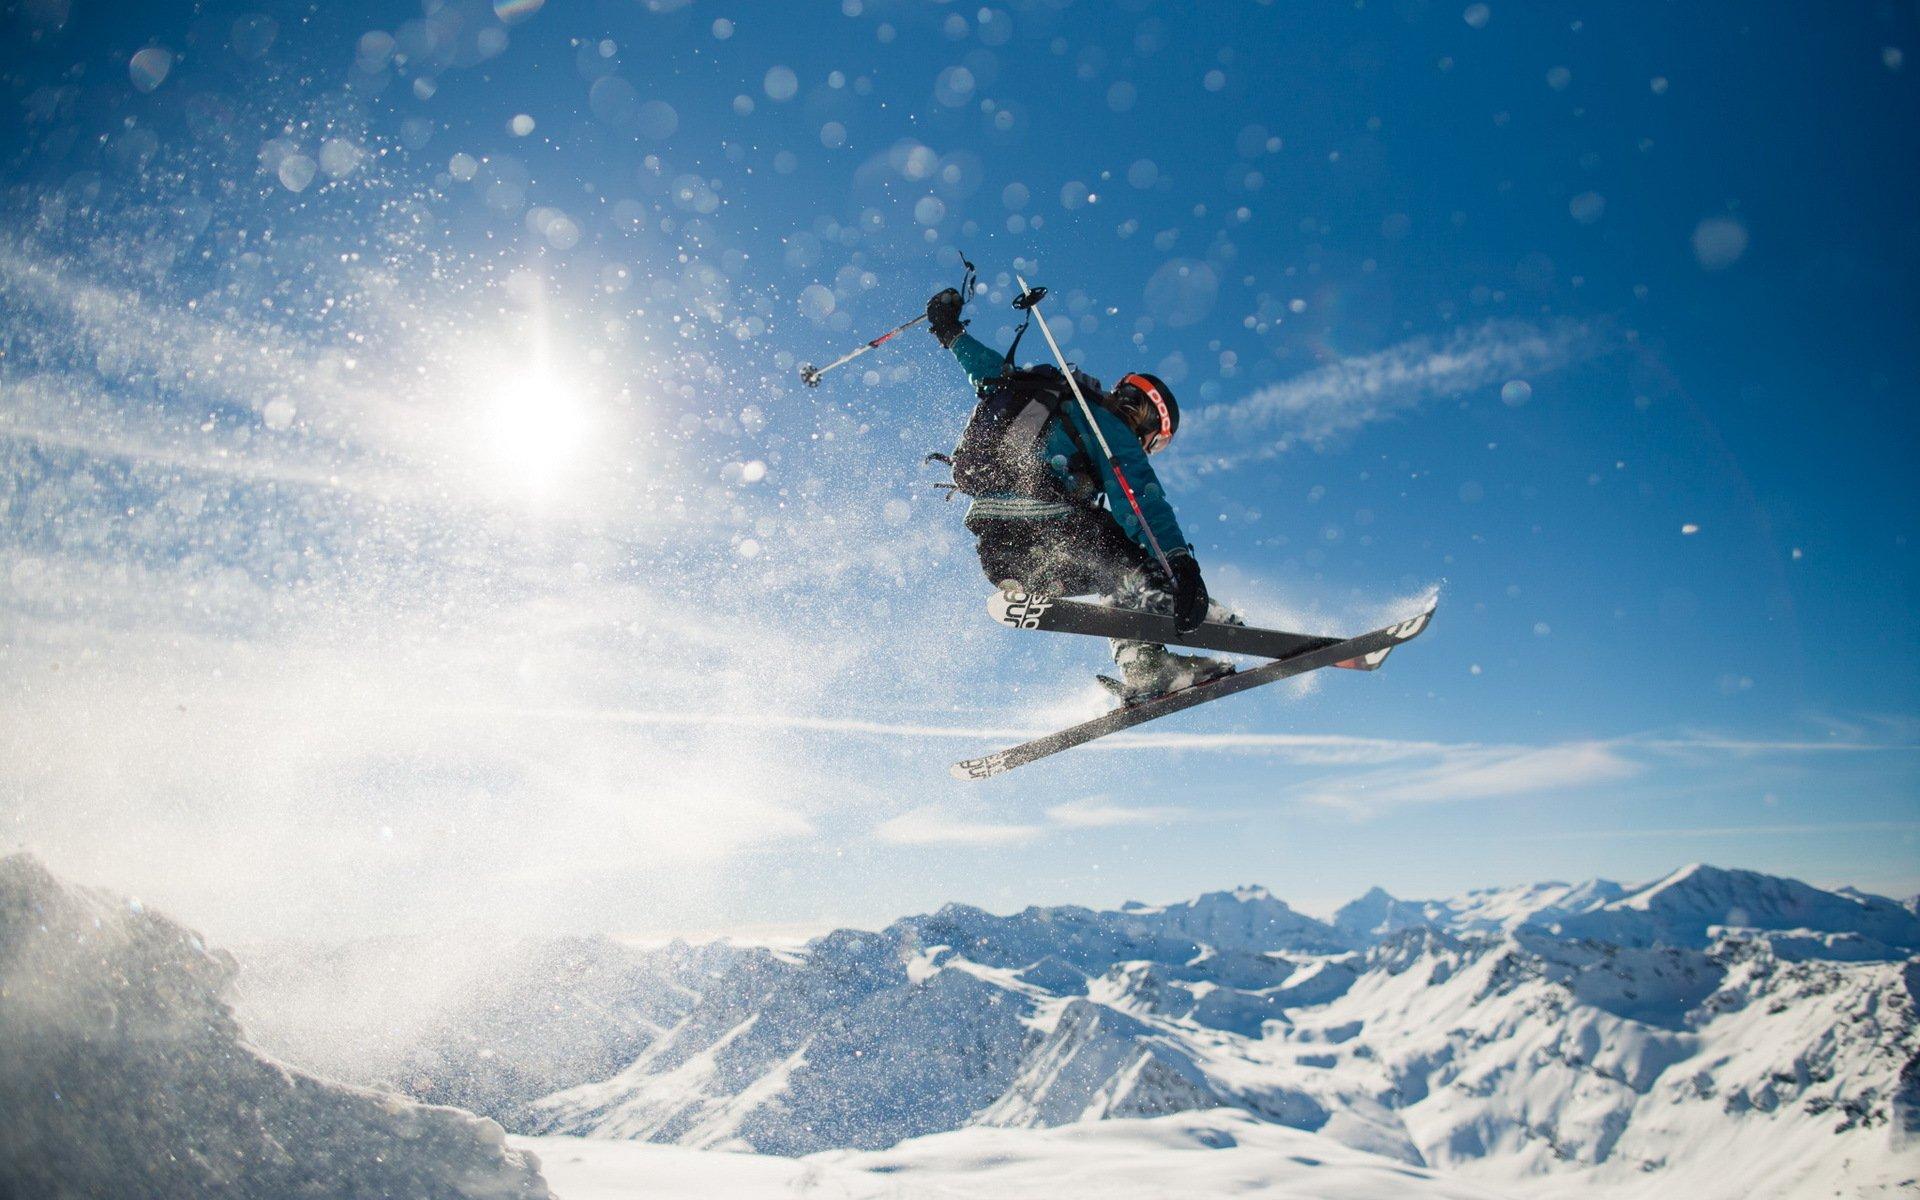 сноубордист вираж снег солнце  № 3559561 без смс